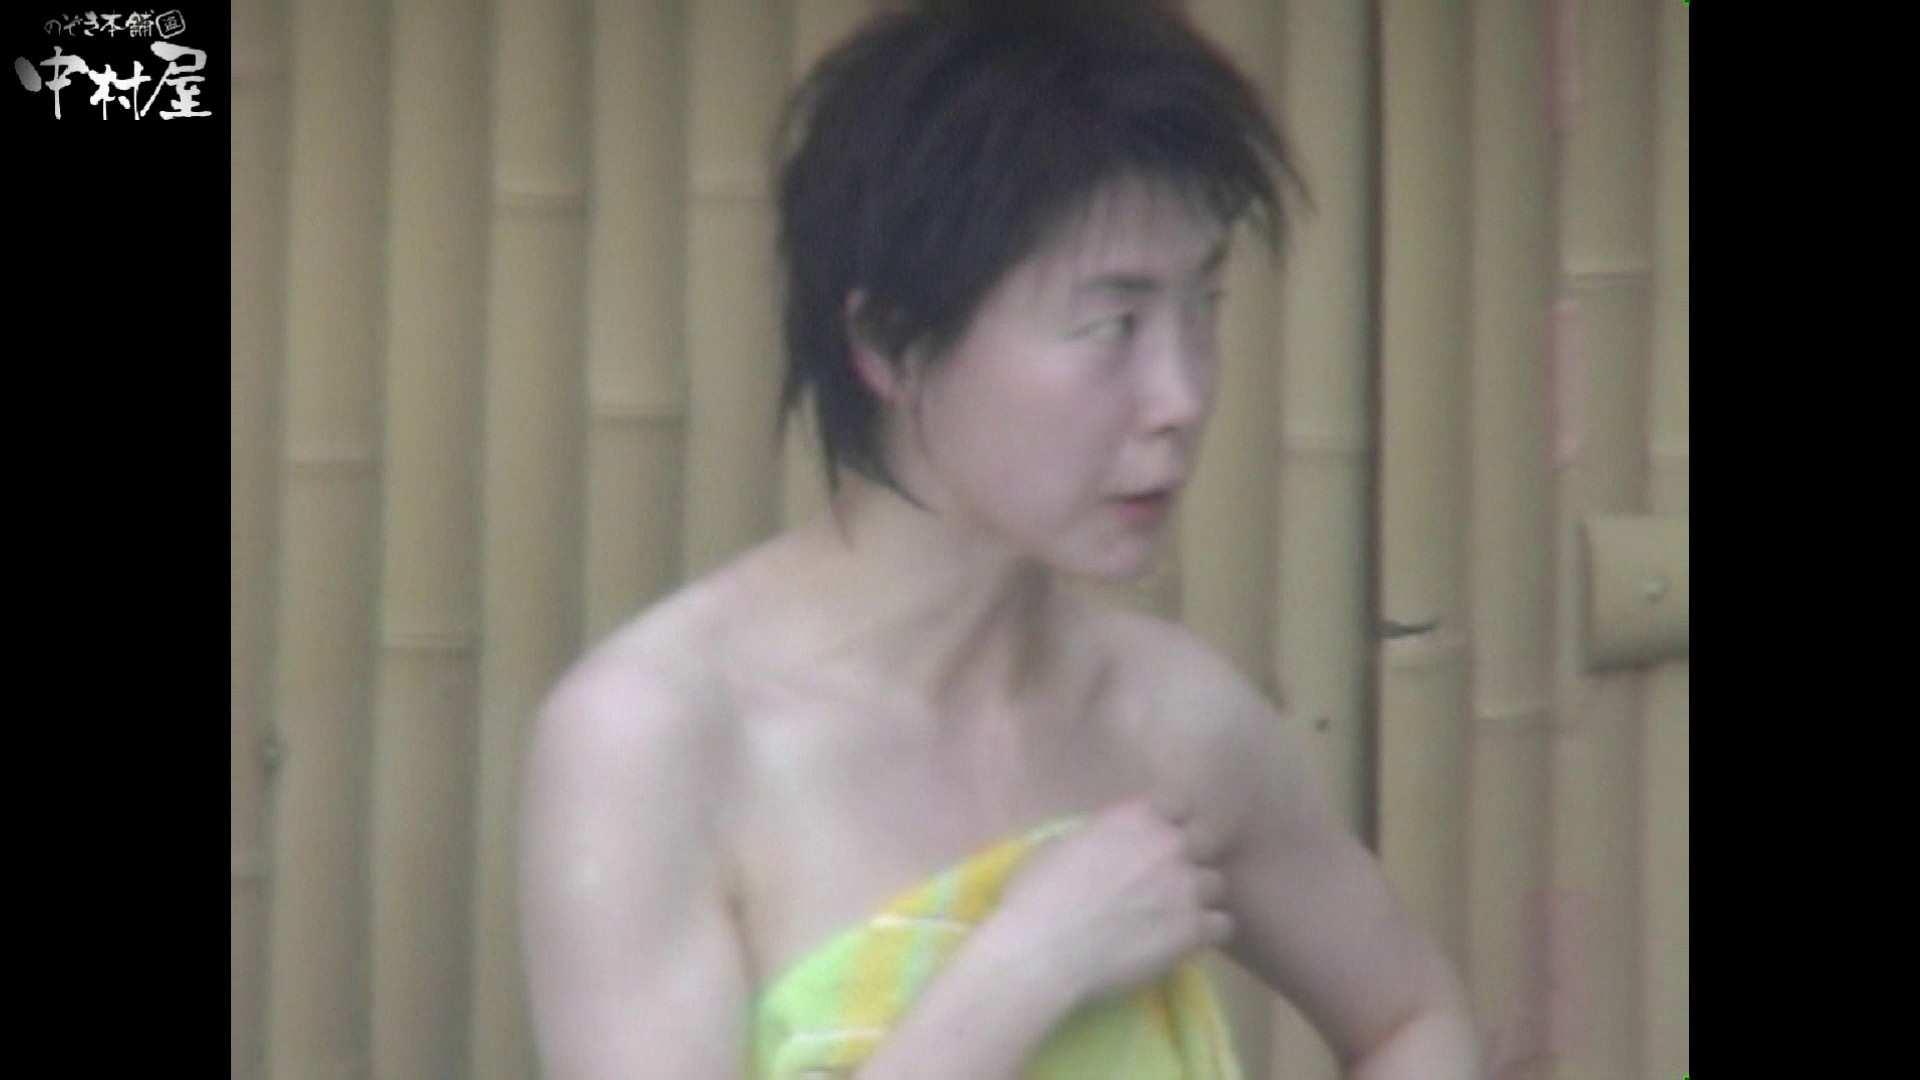 Aquaな露天風呂Vol.938 露天 濡れ場動画紹介 111pic 87